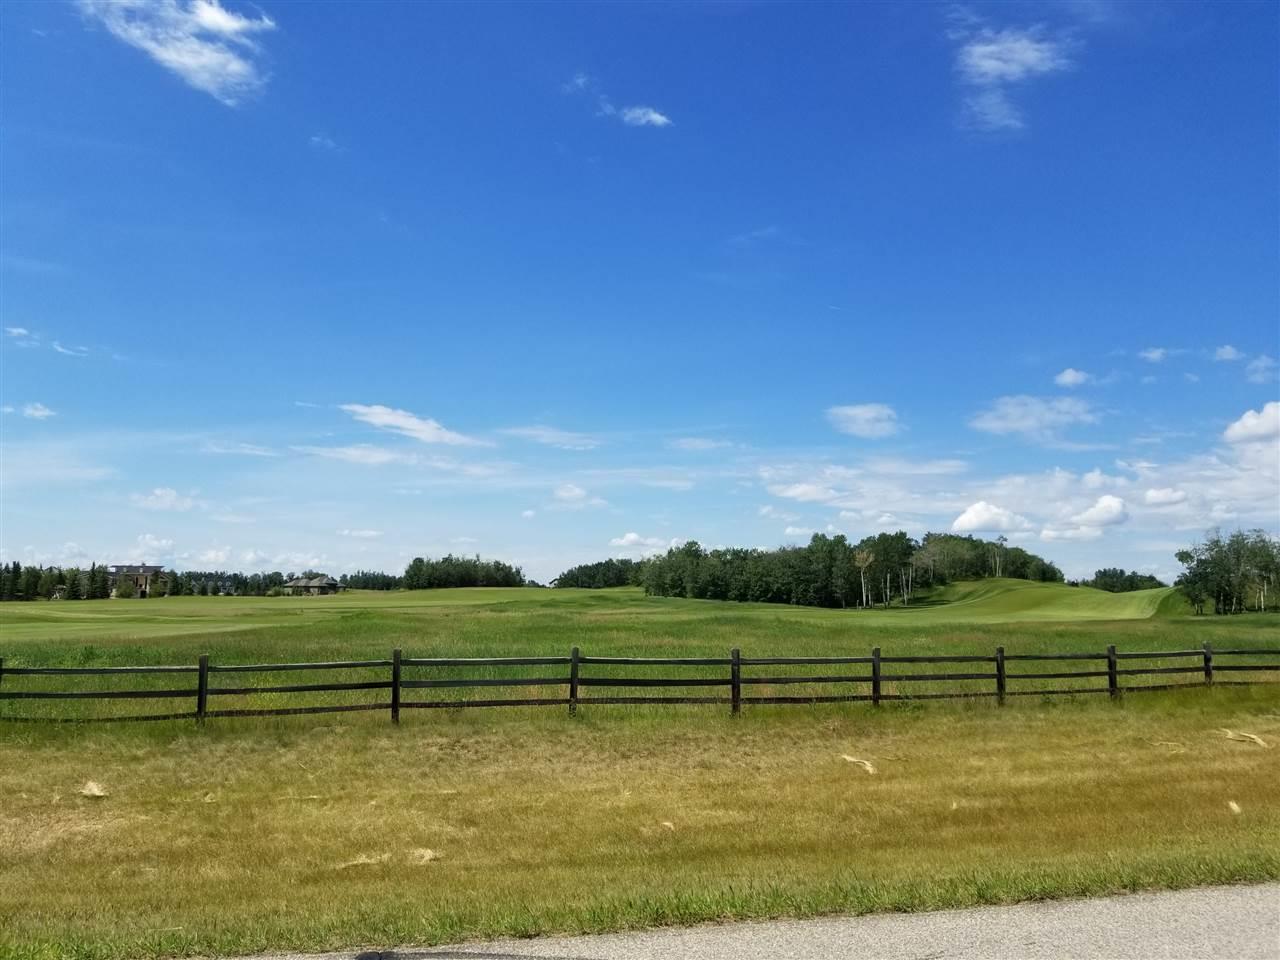 57 25527 Twp Rd 511 A Rd, Rural Parkland County, Alberta  T7Y 1B8 - Photo 5 - E4235773